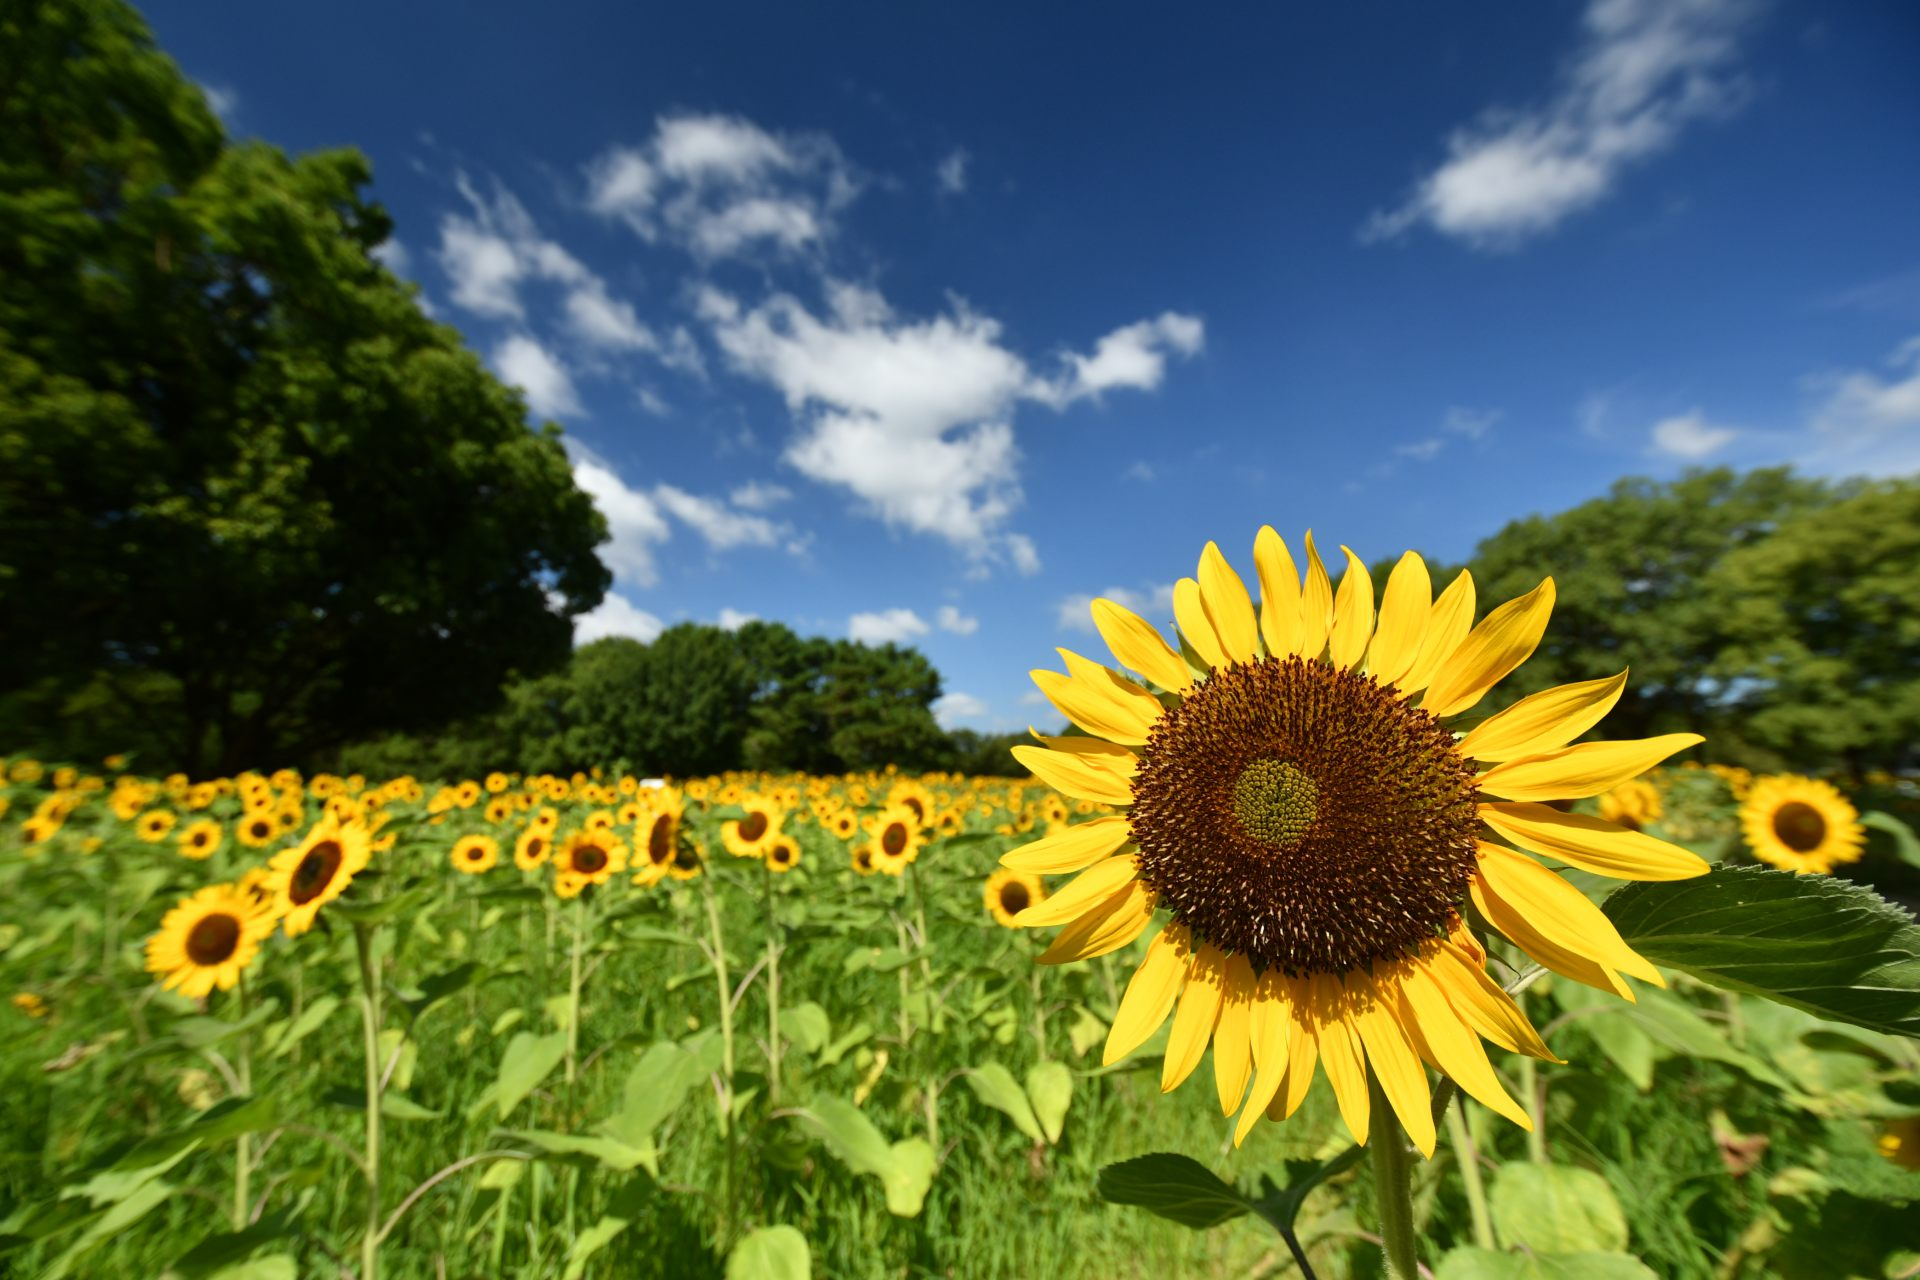 Around 10,000 Sunflowers of 22 Varieties